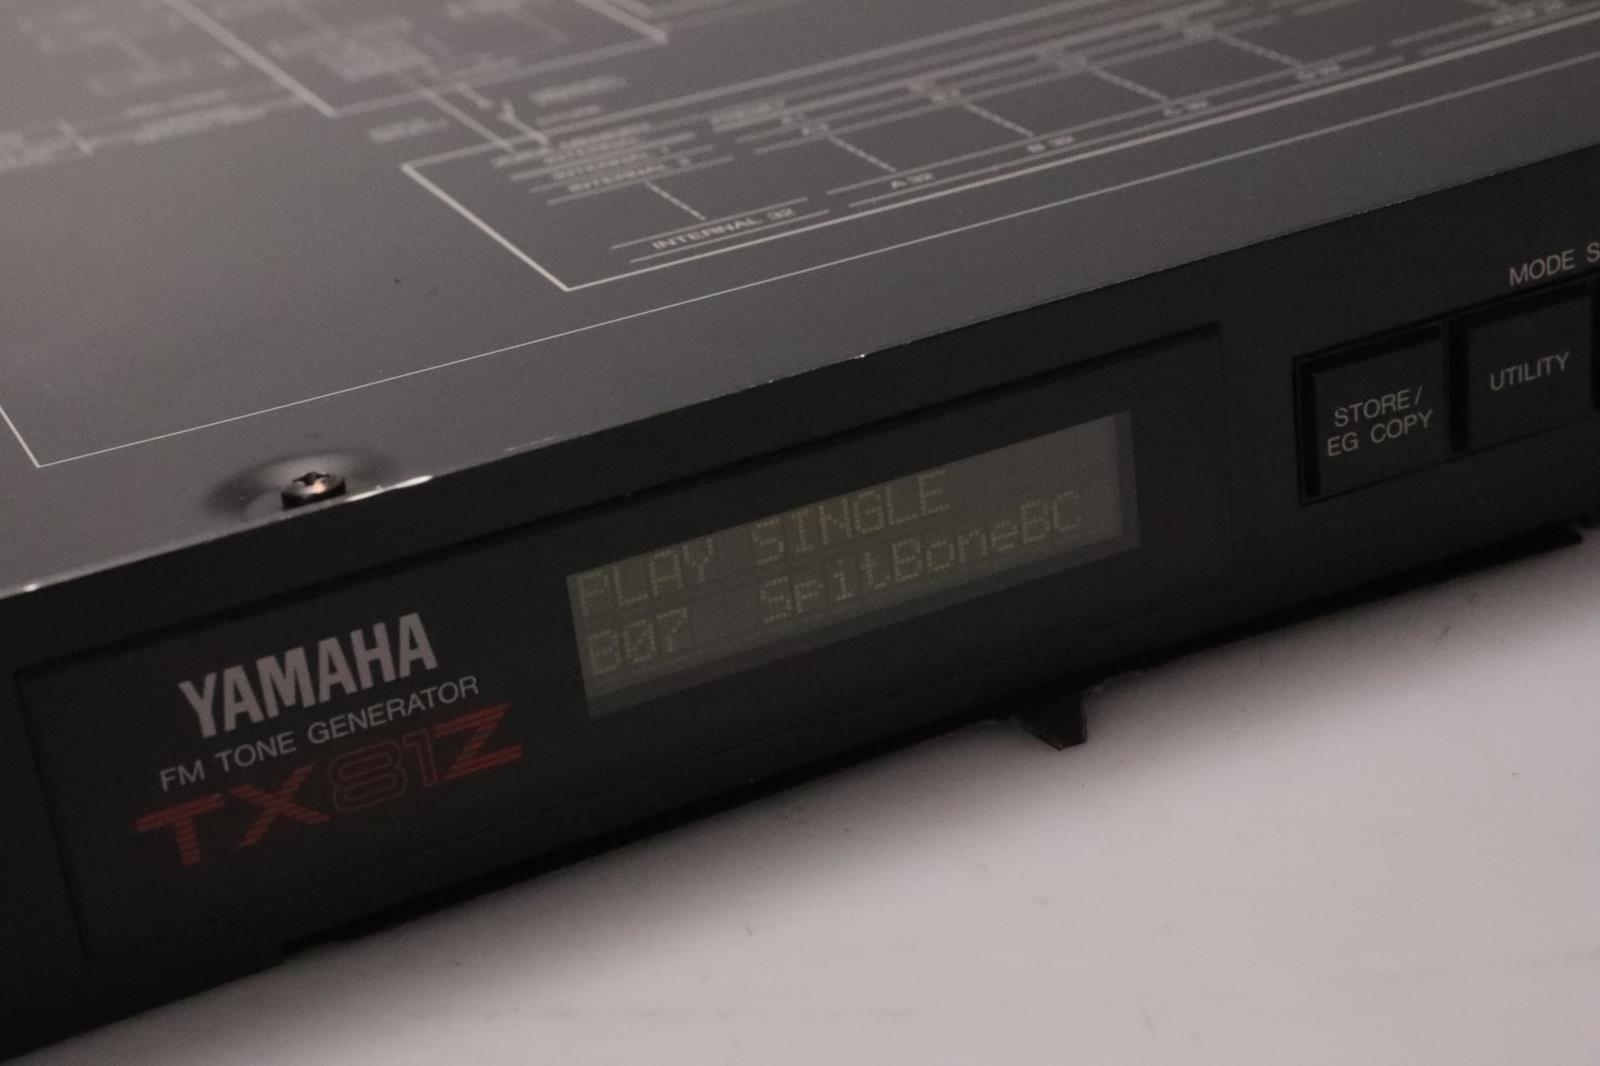 Yamaha TX81Z FM Tone Generator Multi-Timbral Synthesizer Module #36970